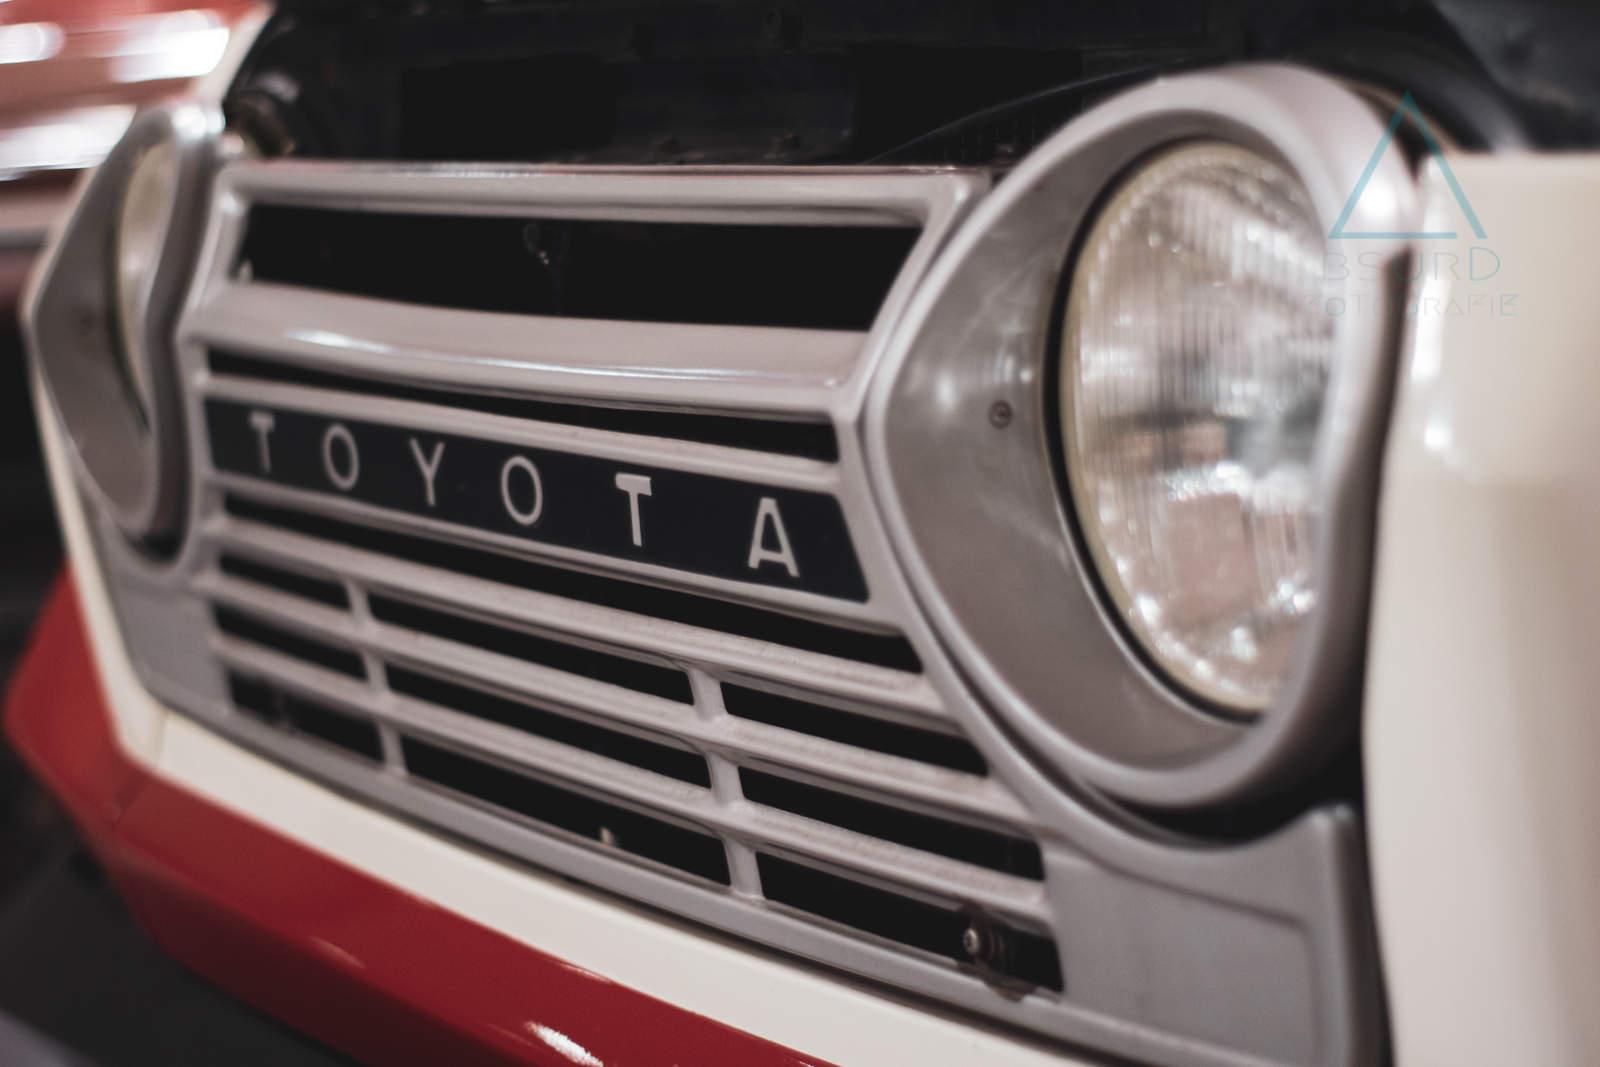 2019-01-05-Toyota-Collection-Koeln - DSC01706-edit-55.jpg